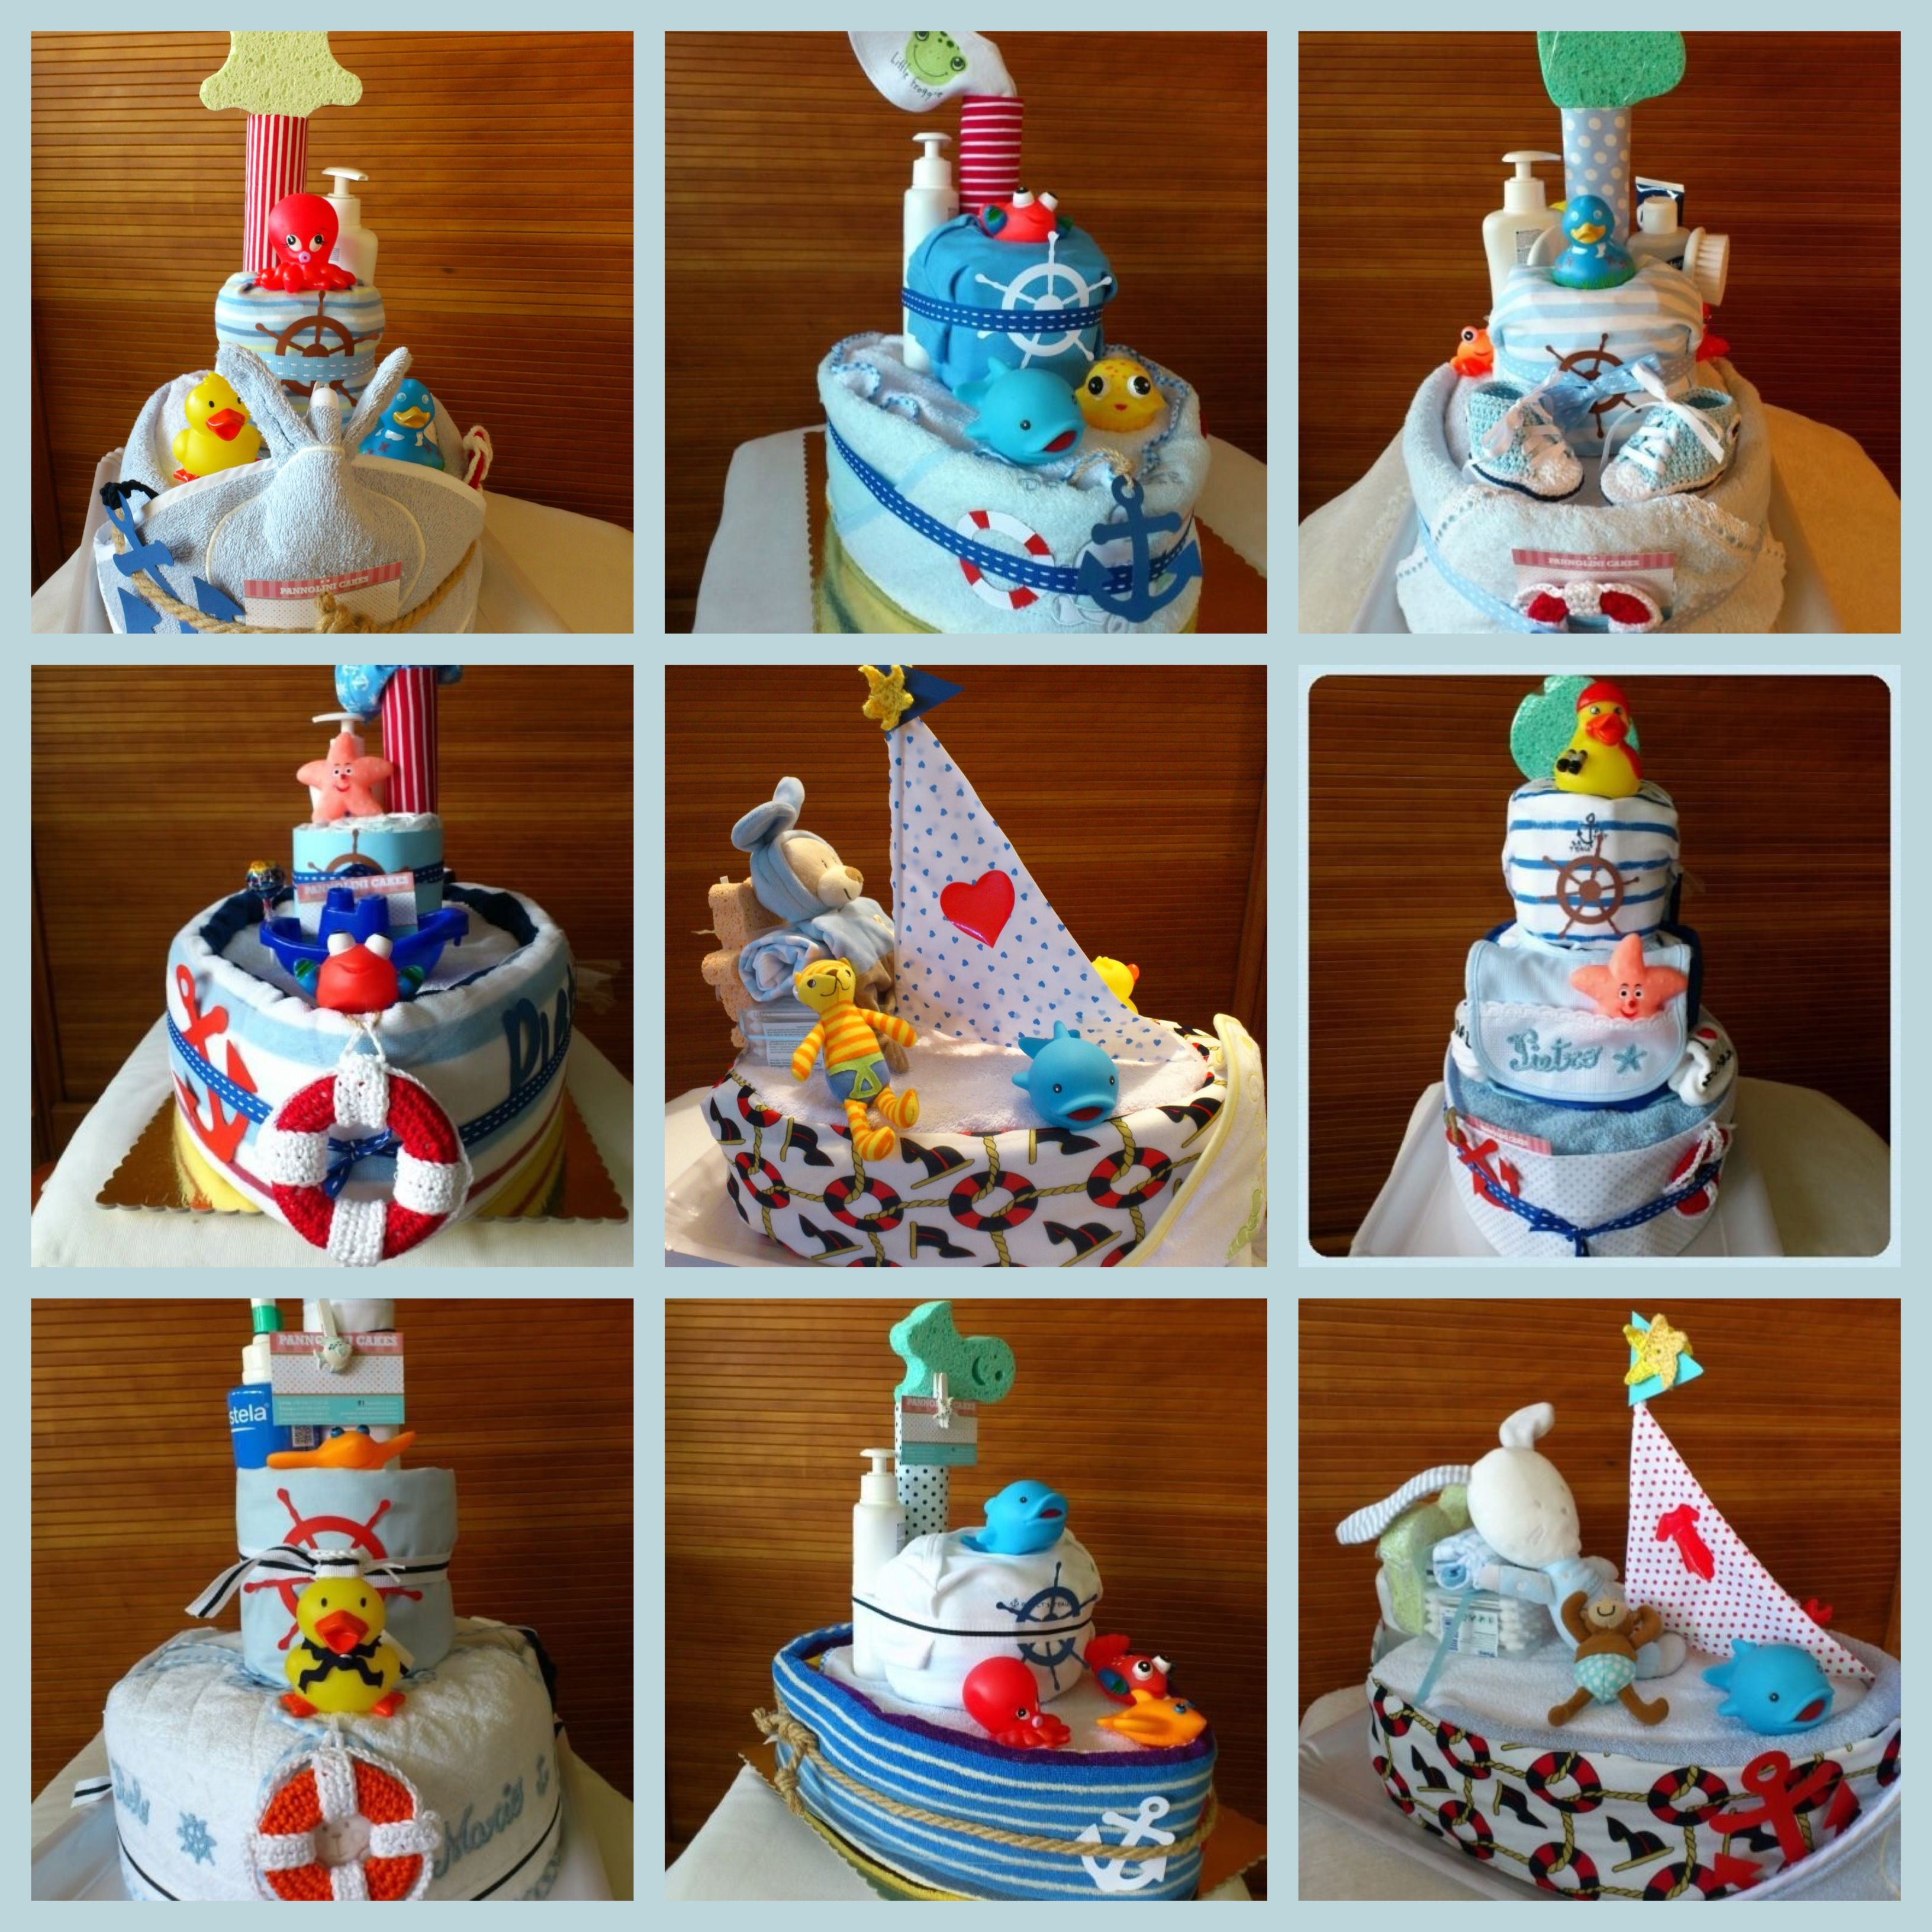 Boat Diaper Cakes Gifts Boat Diaper Cake Diaper Cakes